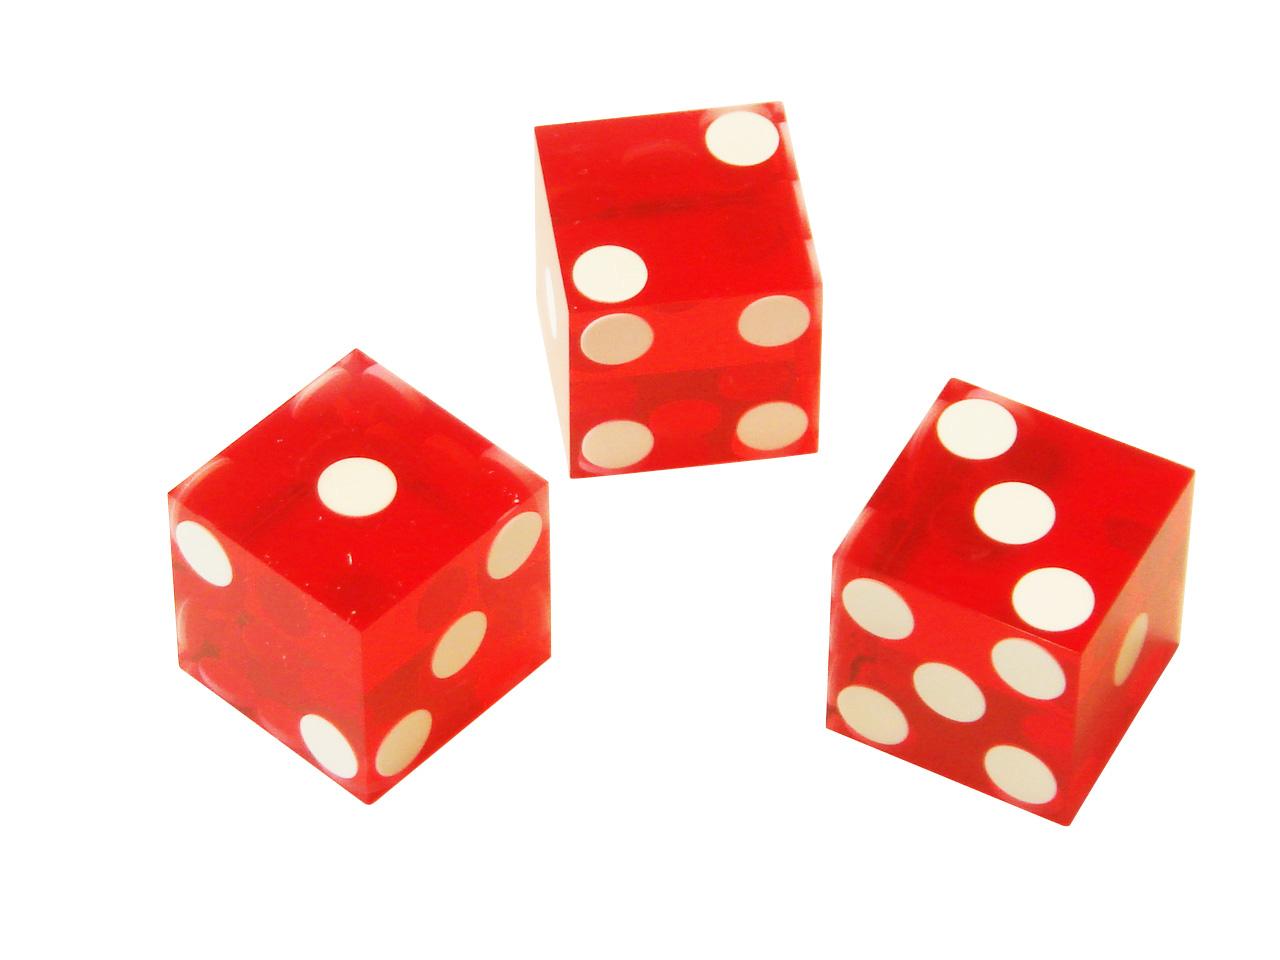 spielzeug mehr casino w rfel standard 19 3 mm rot. Black Bedroom Furniture Sets. Home Design Ideas